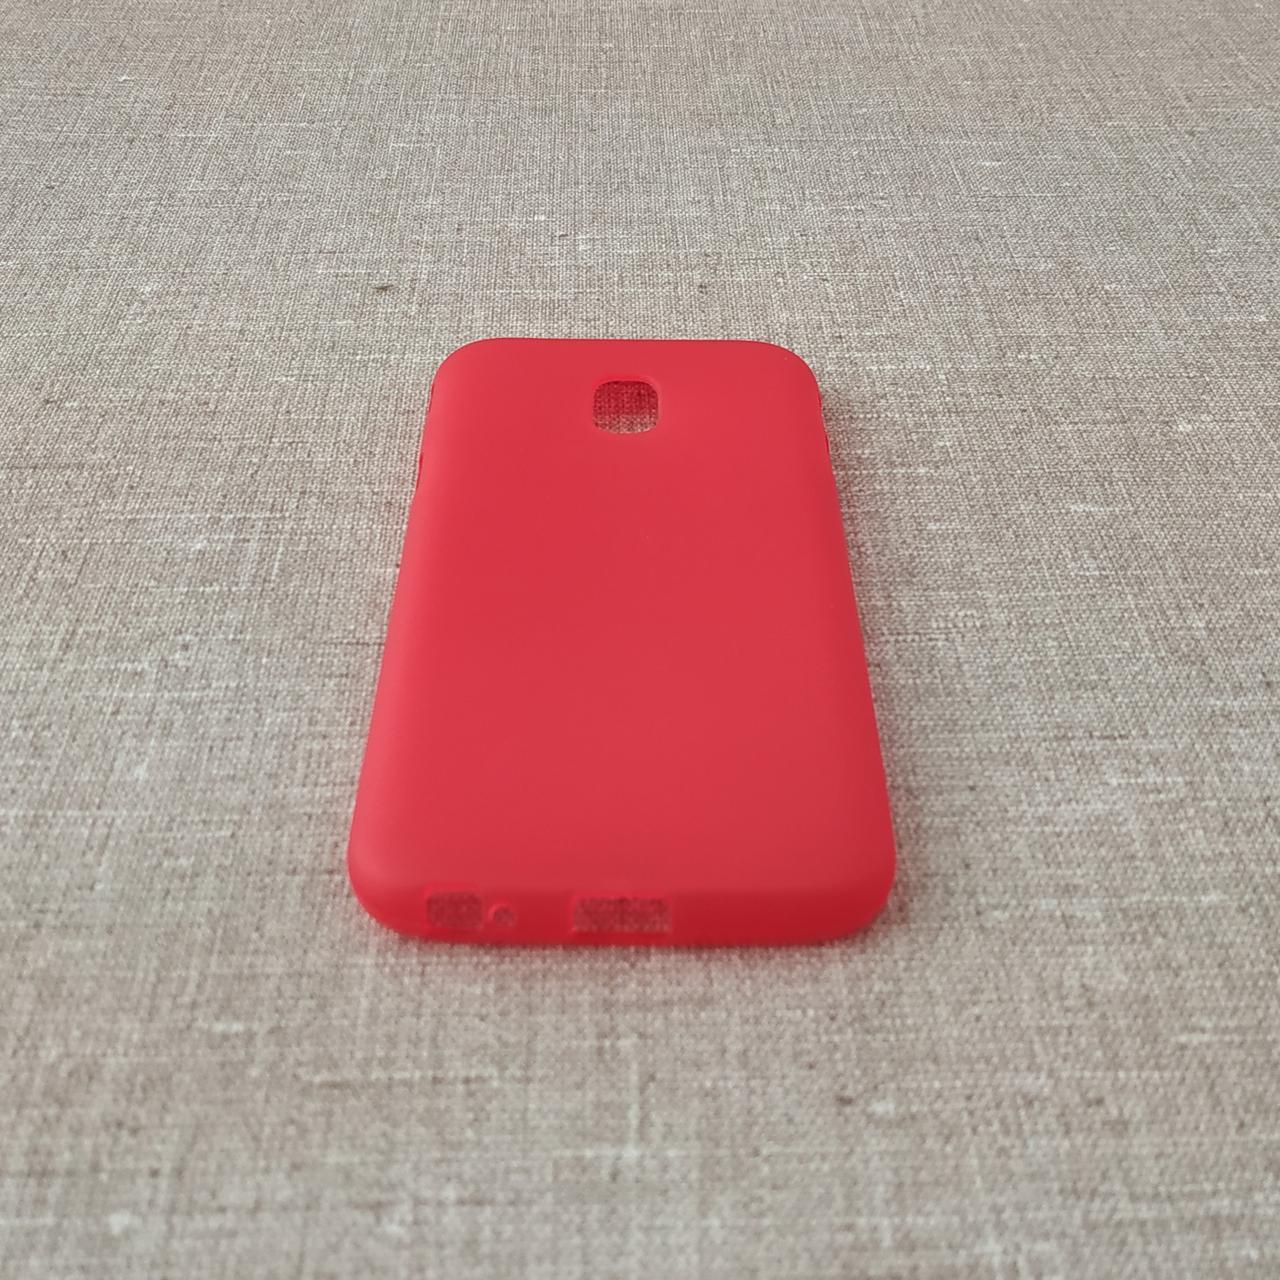 Чехлы для Samsung Galaxy J3 (2017) J330F TPU J330 red (J330) 2017 Для телефона